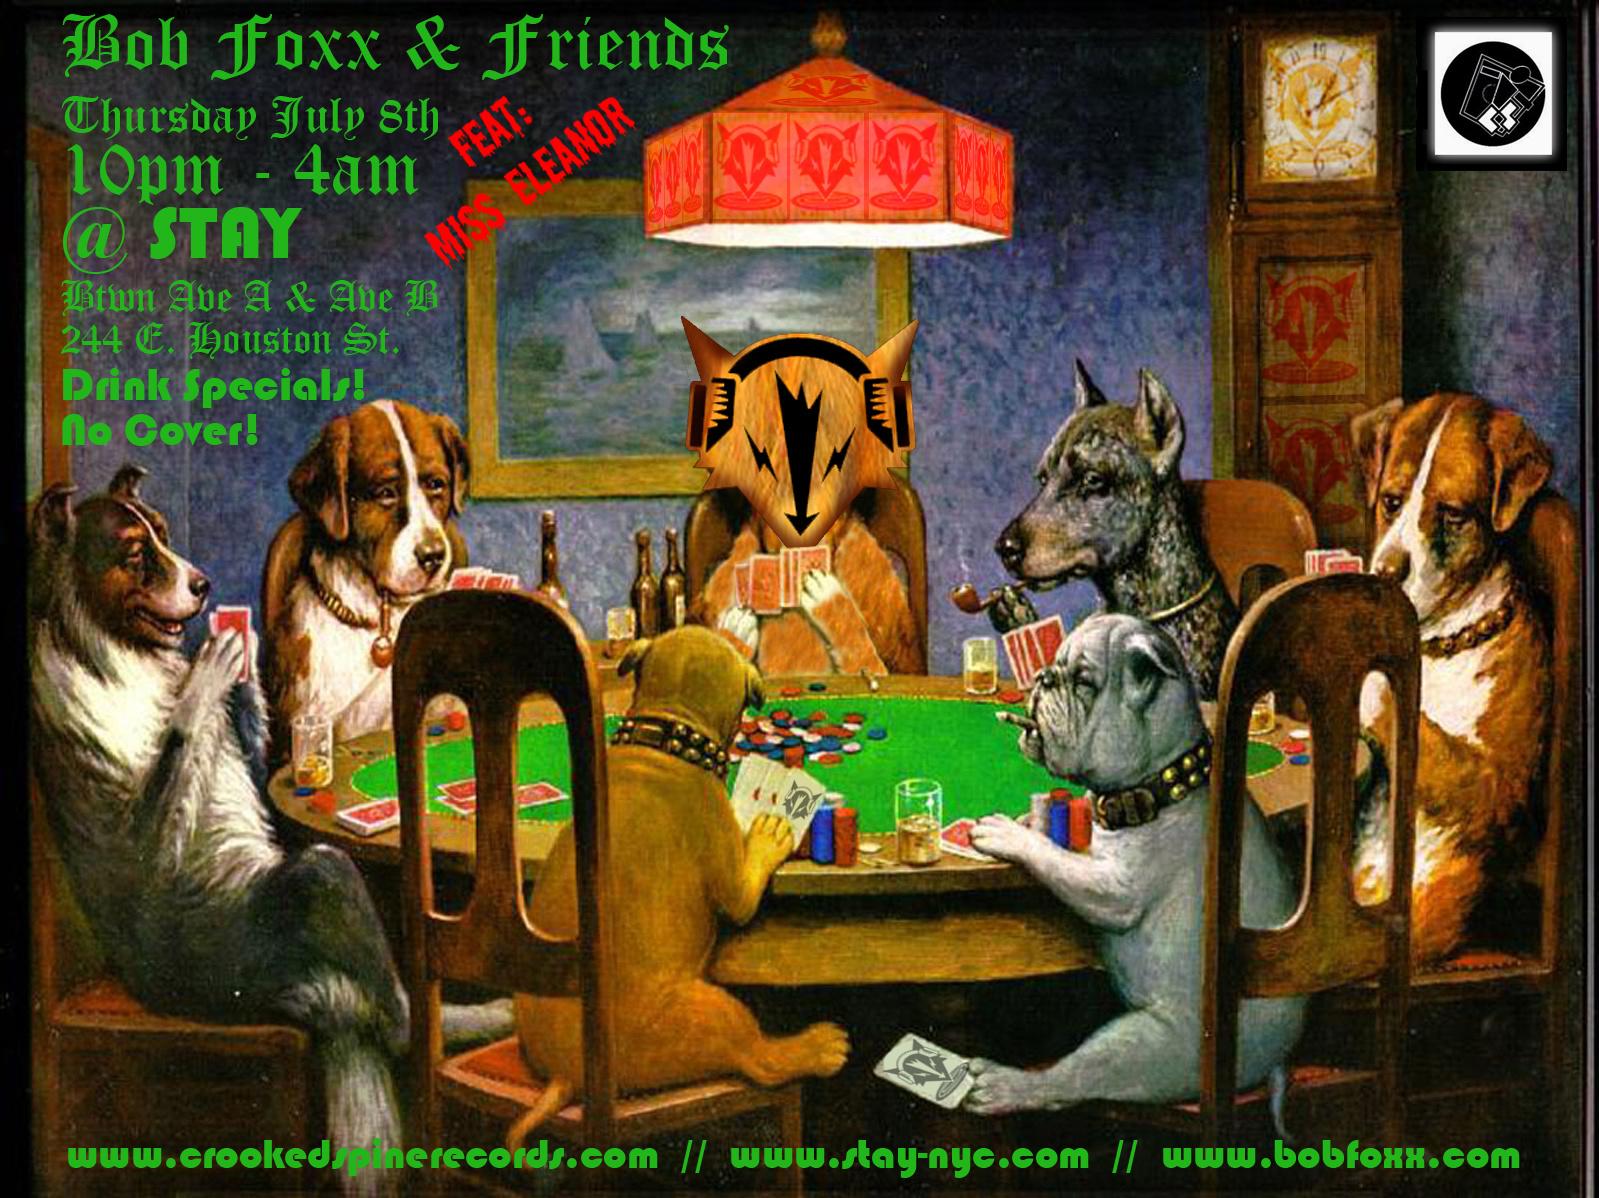 BobFoxx&Friends@Stay_7.8.10_Flyer WEB.jpg